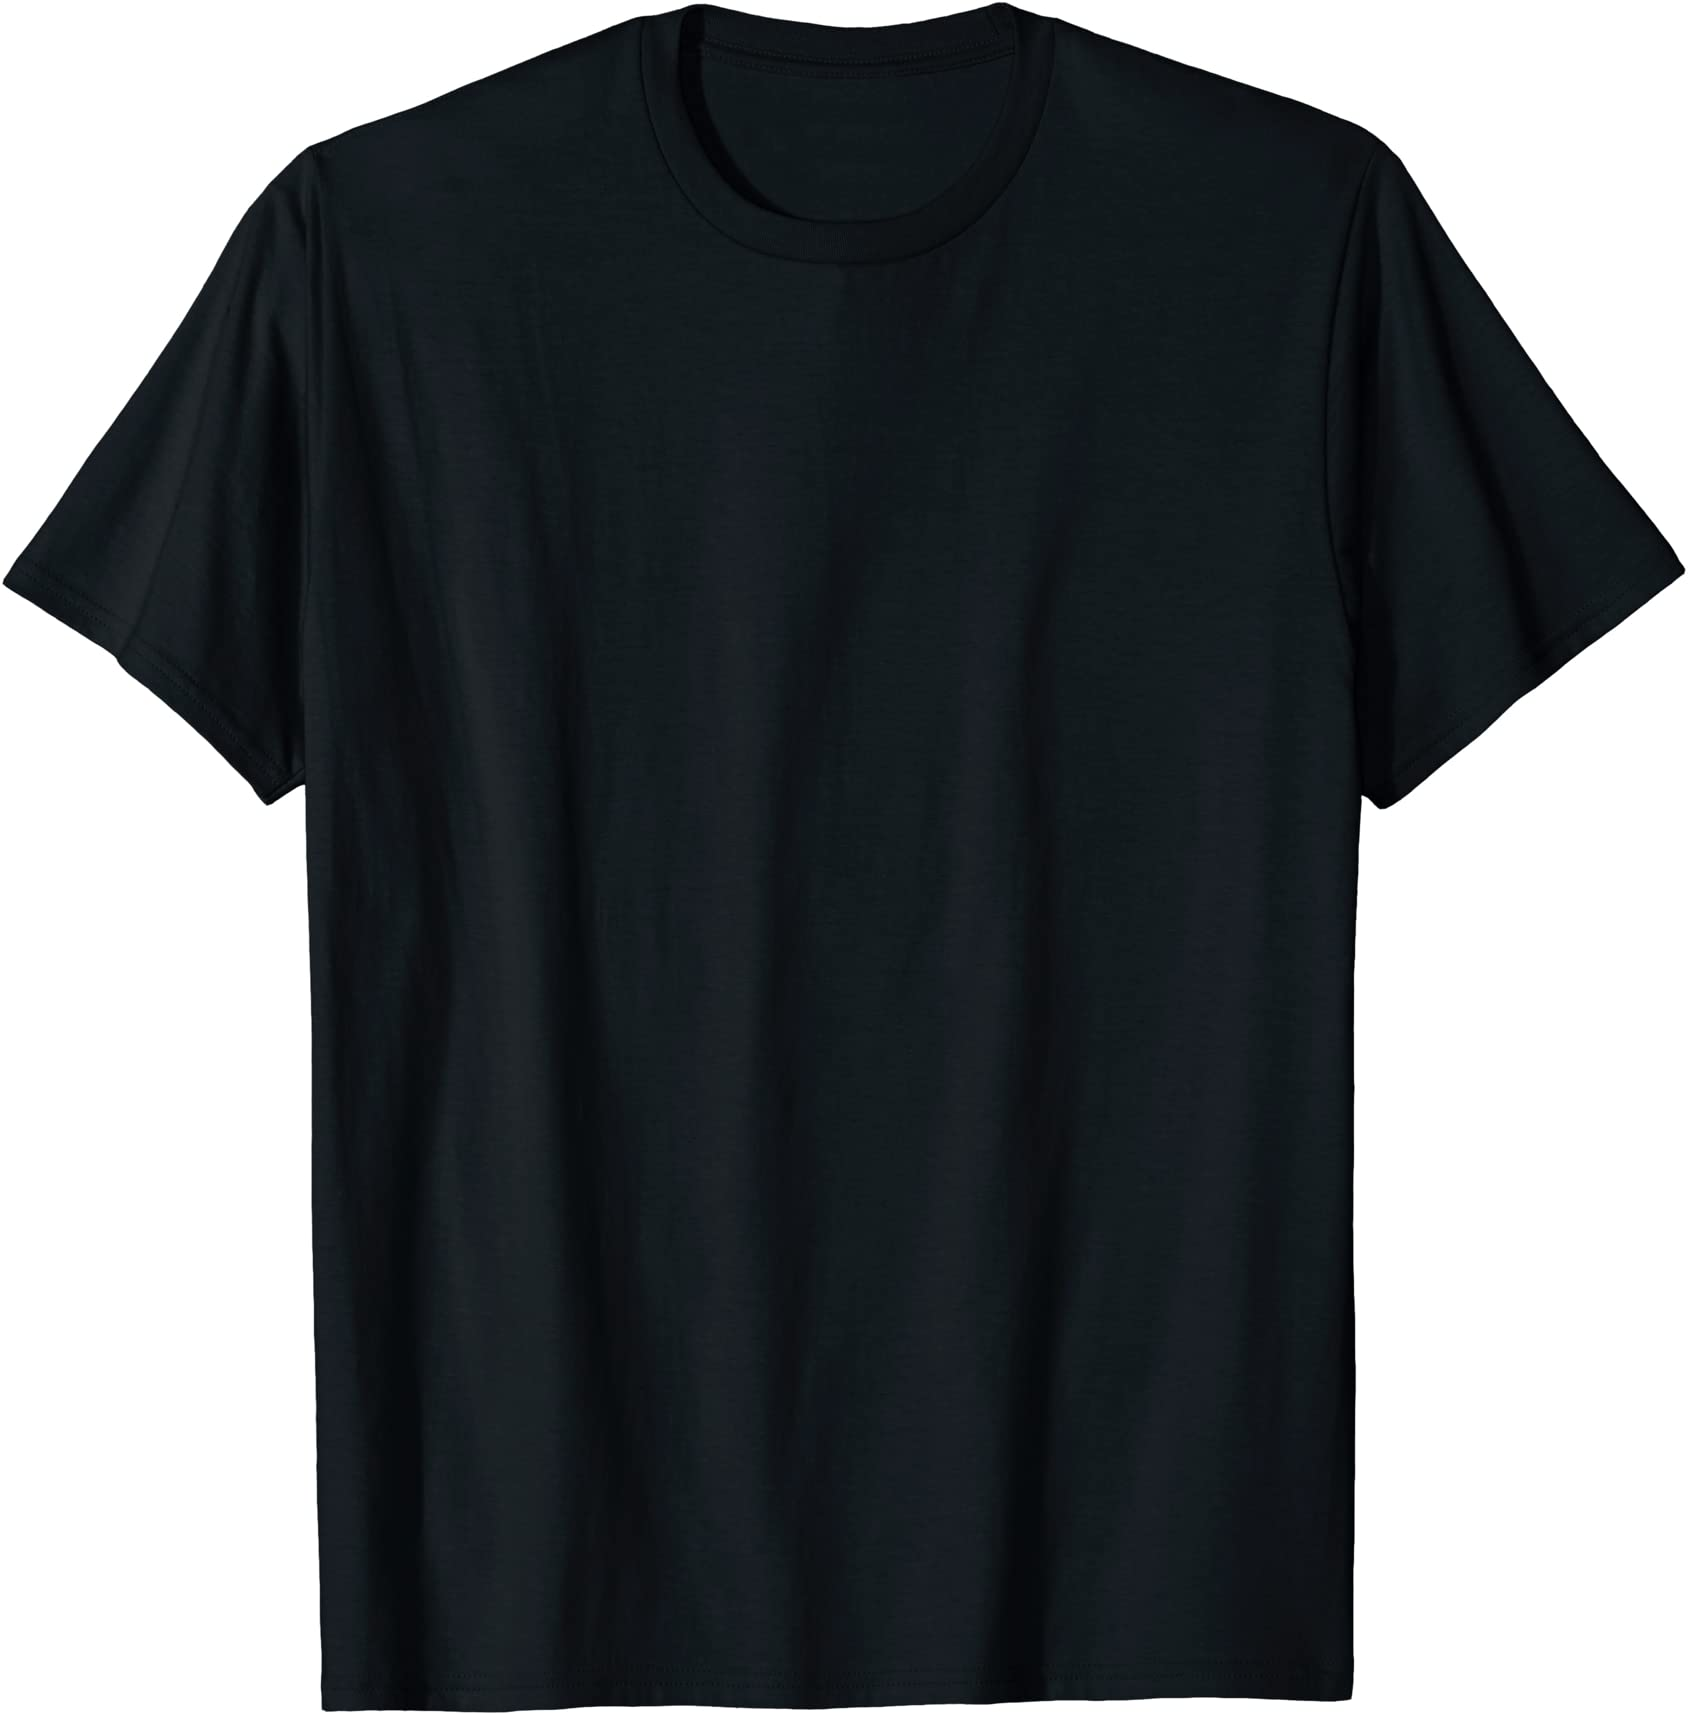 Funny T Shirt You Call Them Swear Words Birthday Joke tee Novelty tshirt T-SHIRT